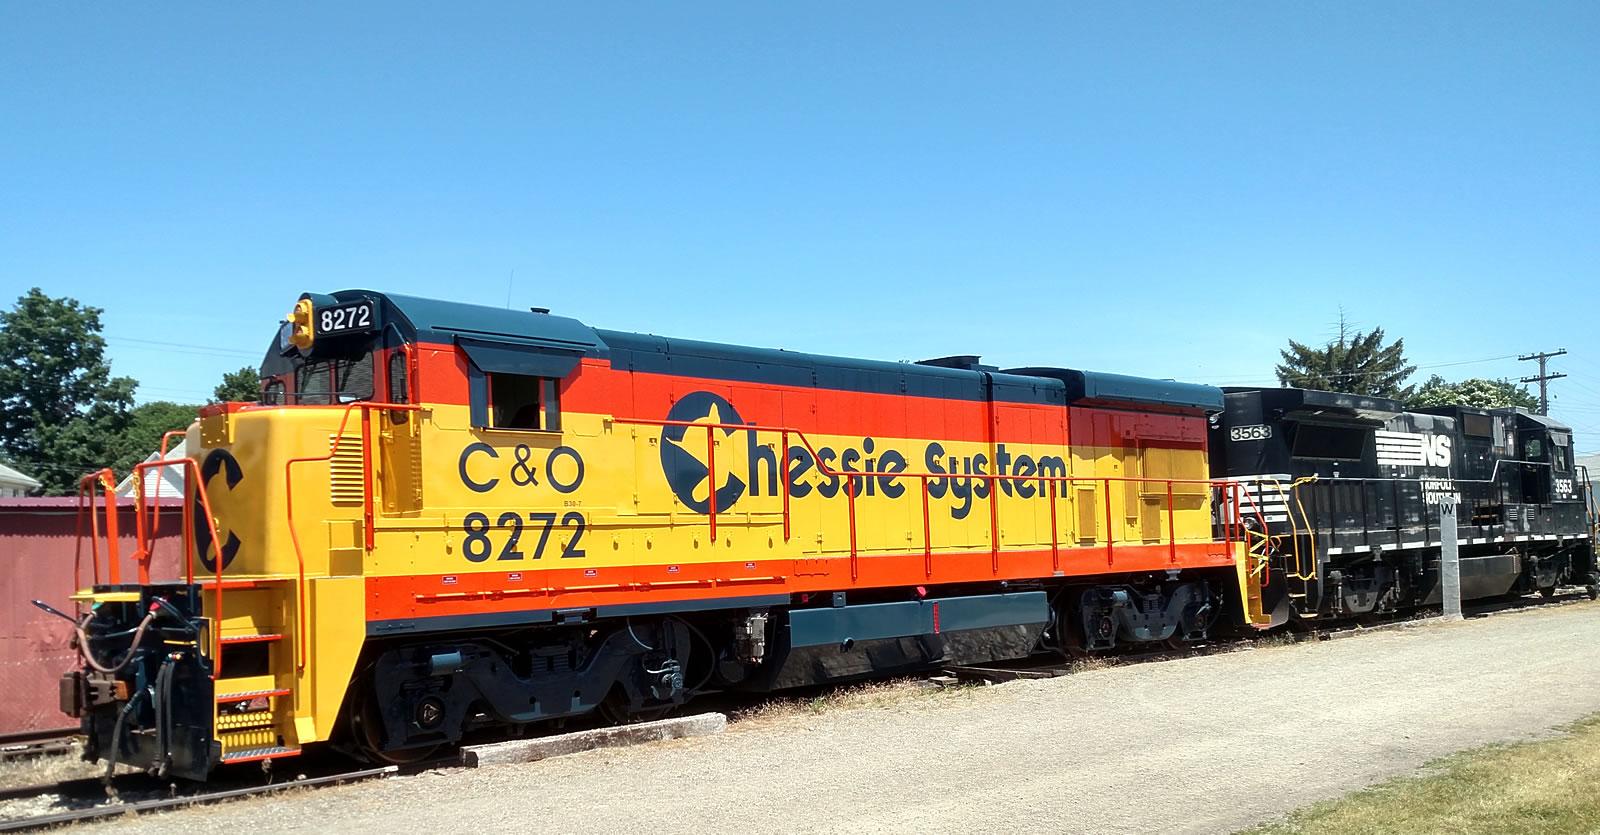 GE Dash 7 locomotive at the Lake Shore Railway Museum